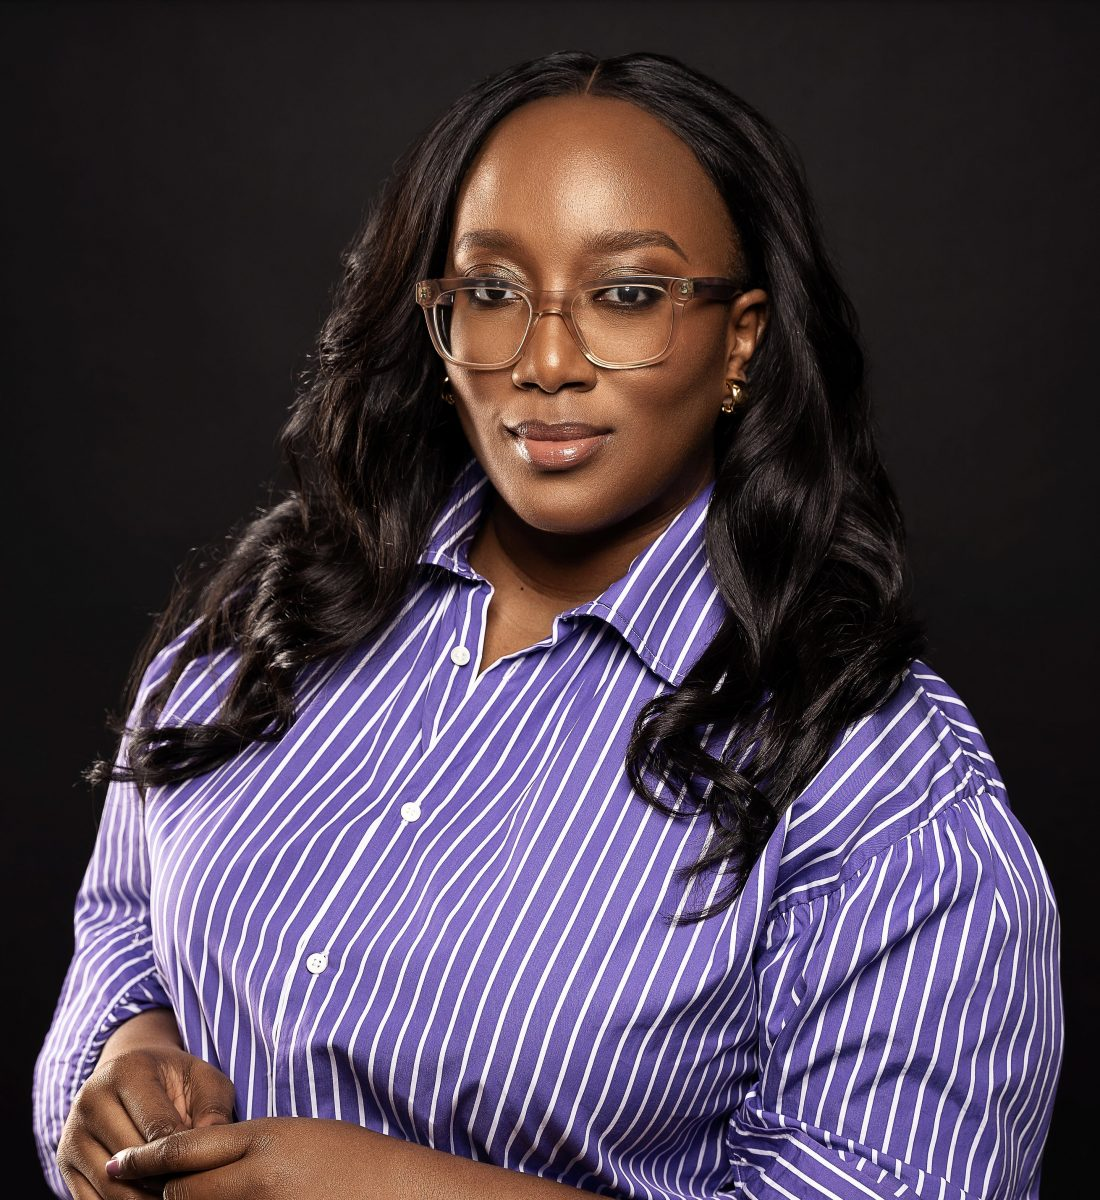 Danielle Corbin, founder of The Ritzury Group